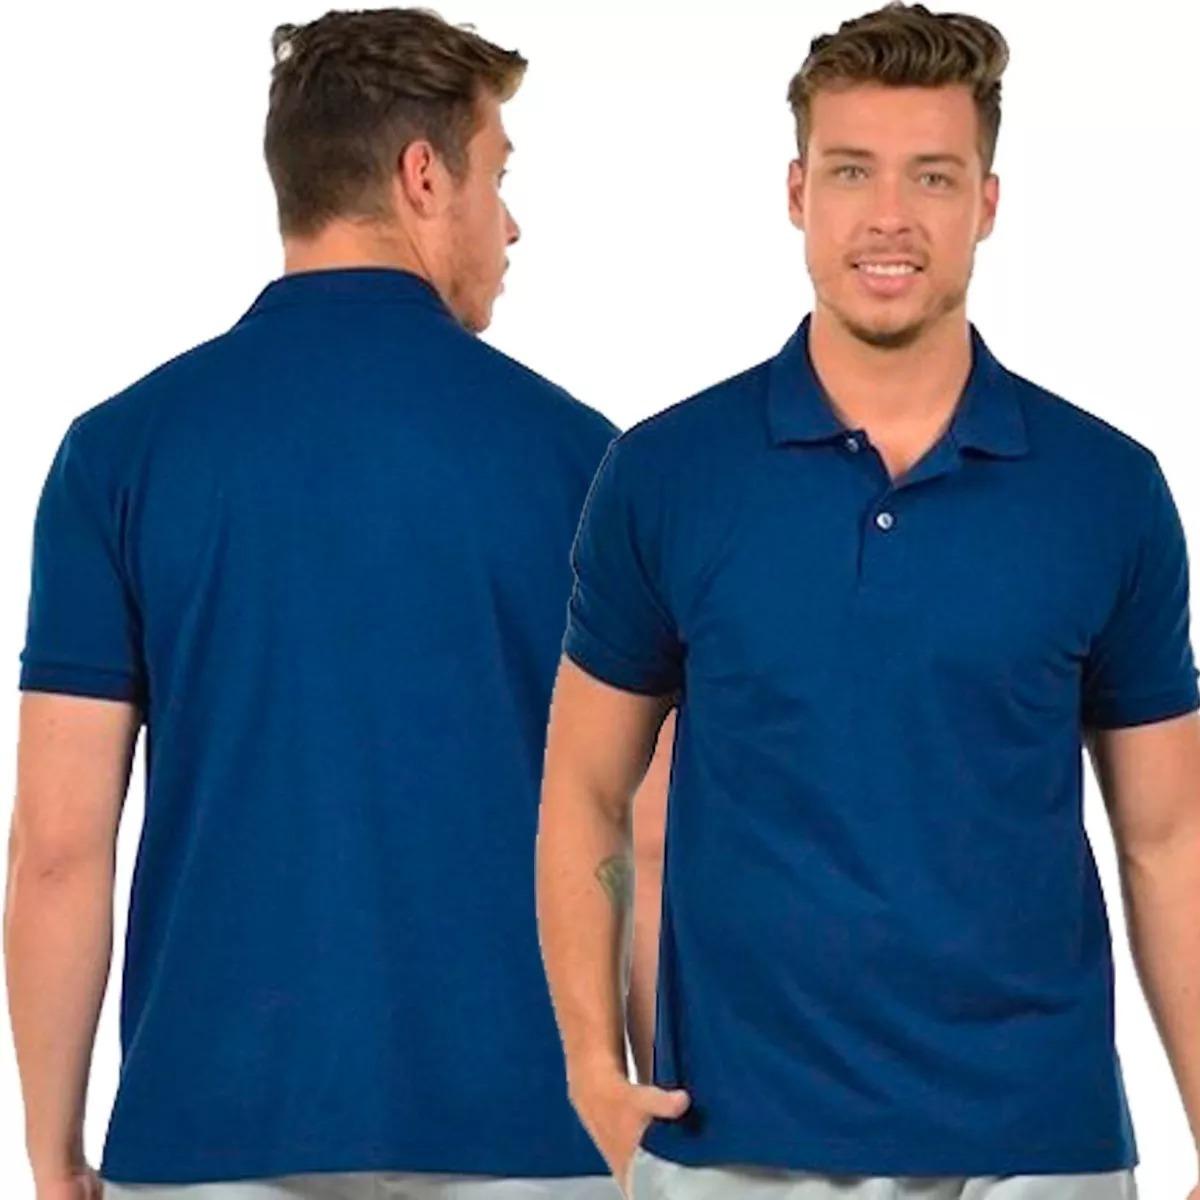 Camisa Polo Masculina Camiseta Gola Atacado Uniforme Bordar - R  29 ... 7e976e1c85cab